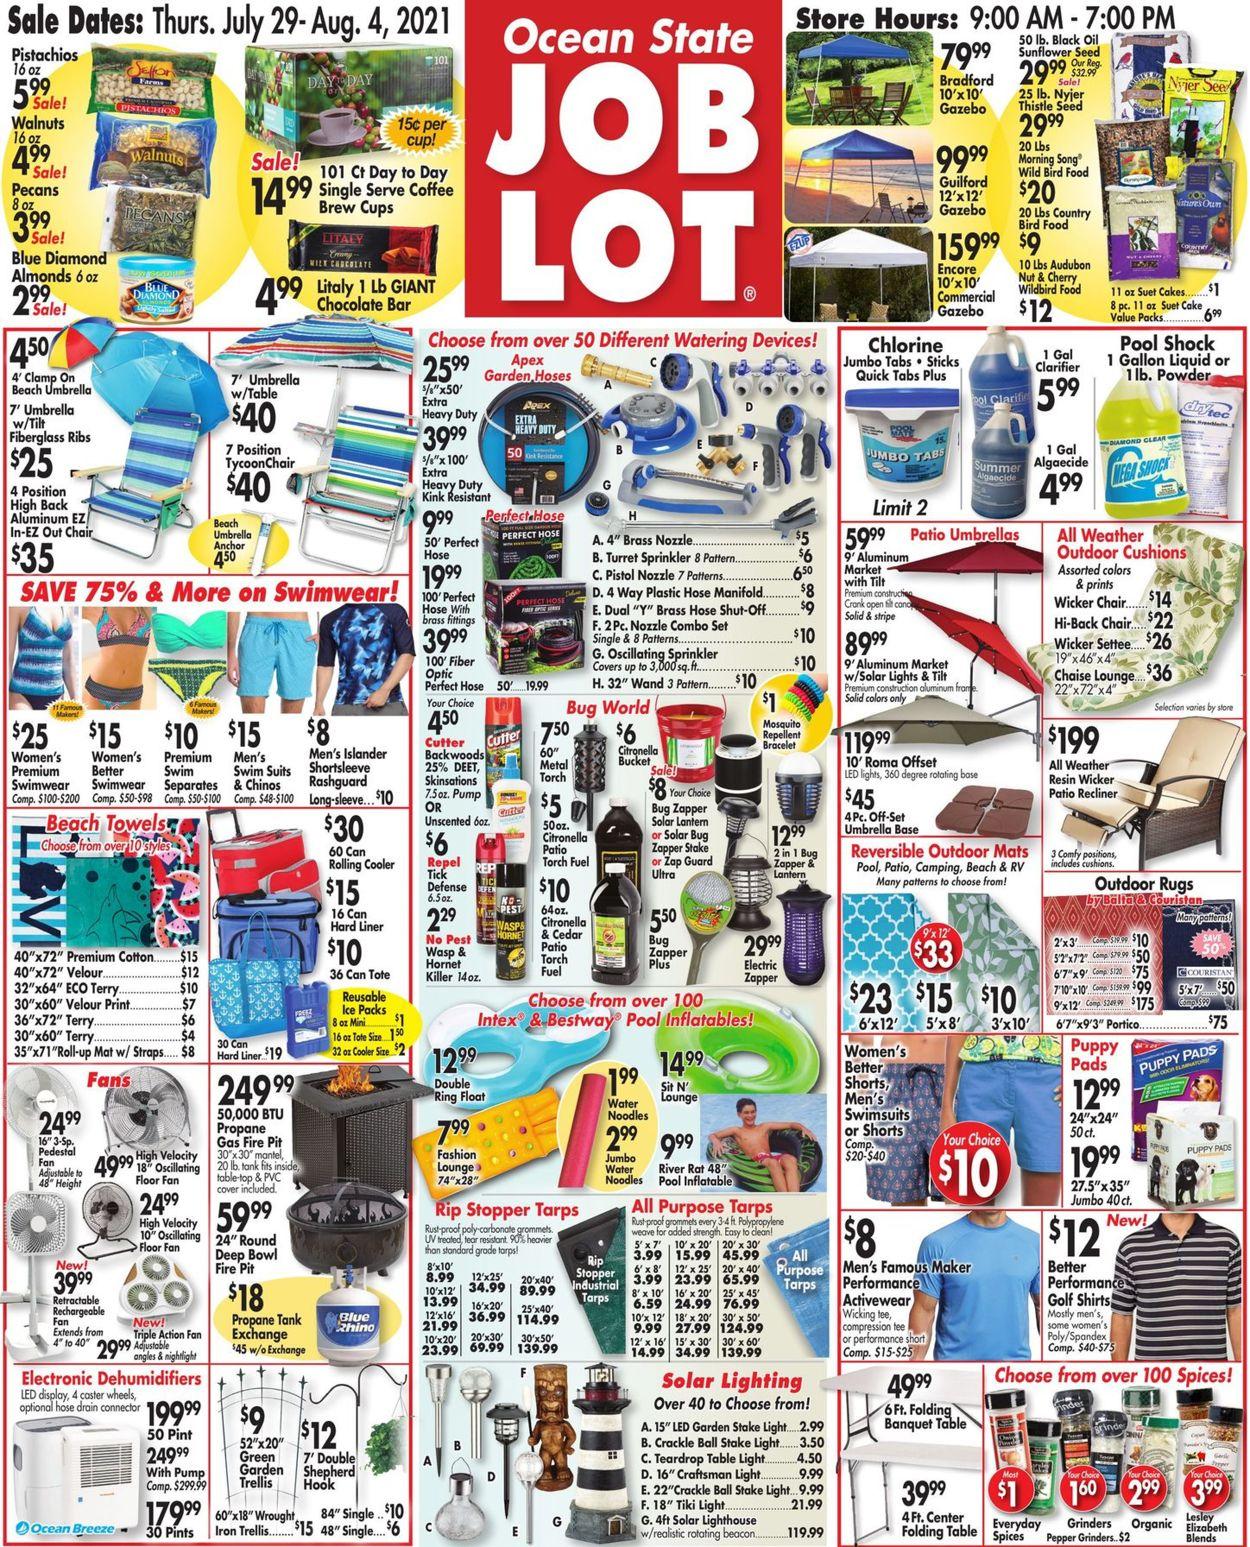 Ocean State Job Lot weekly-ad